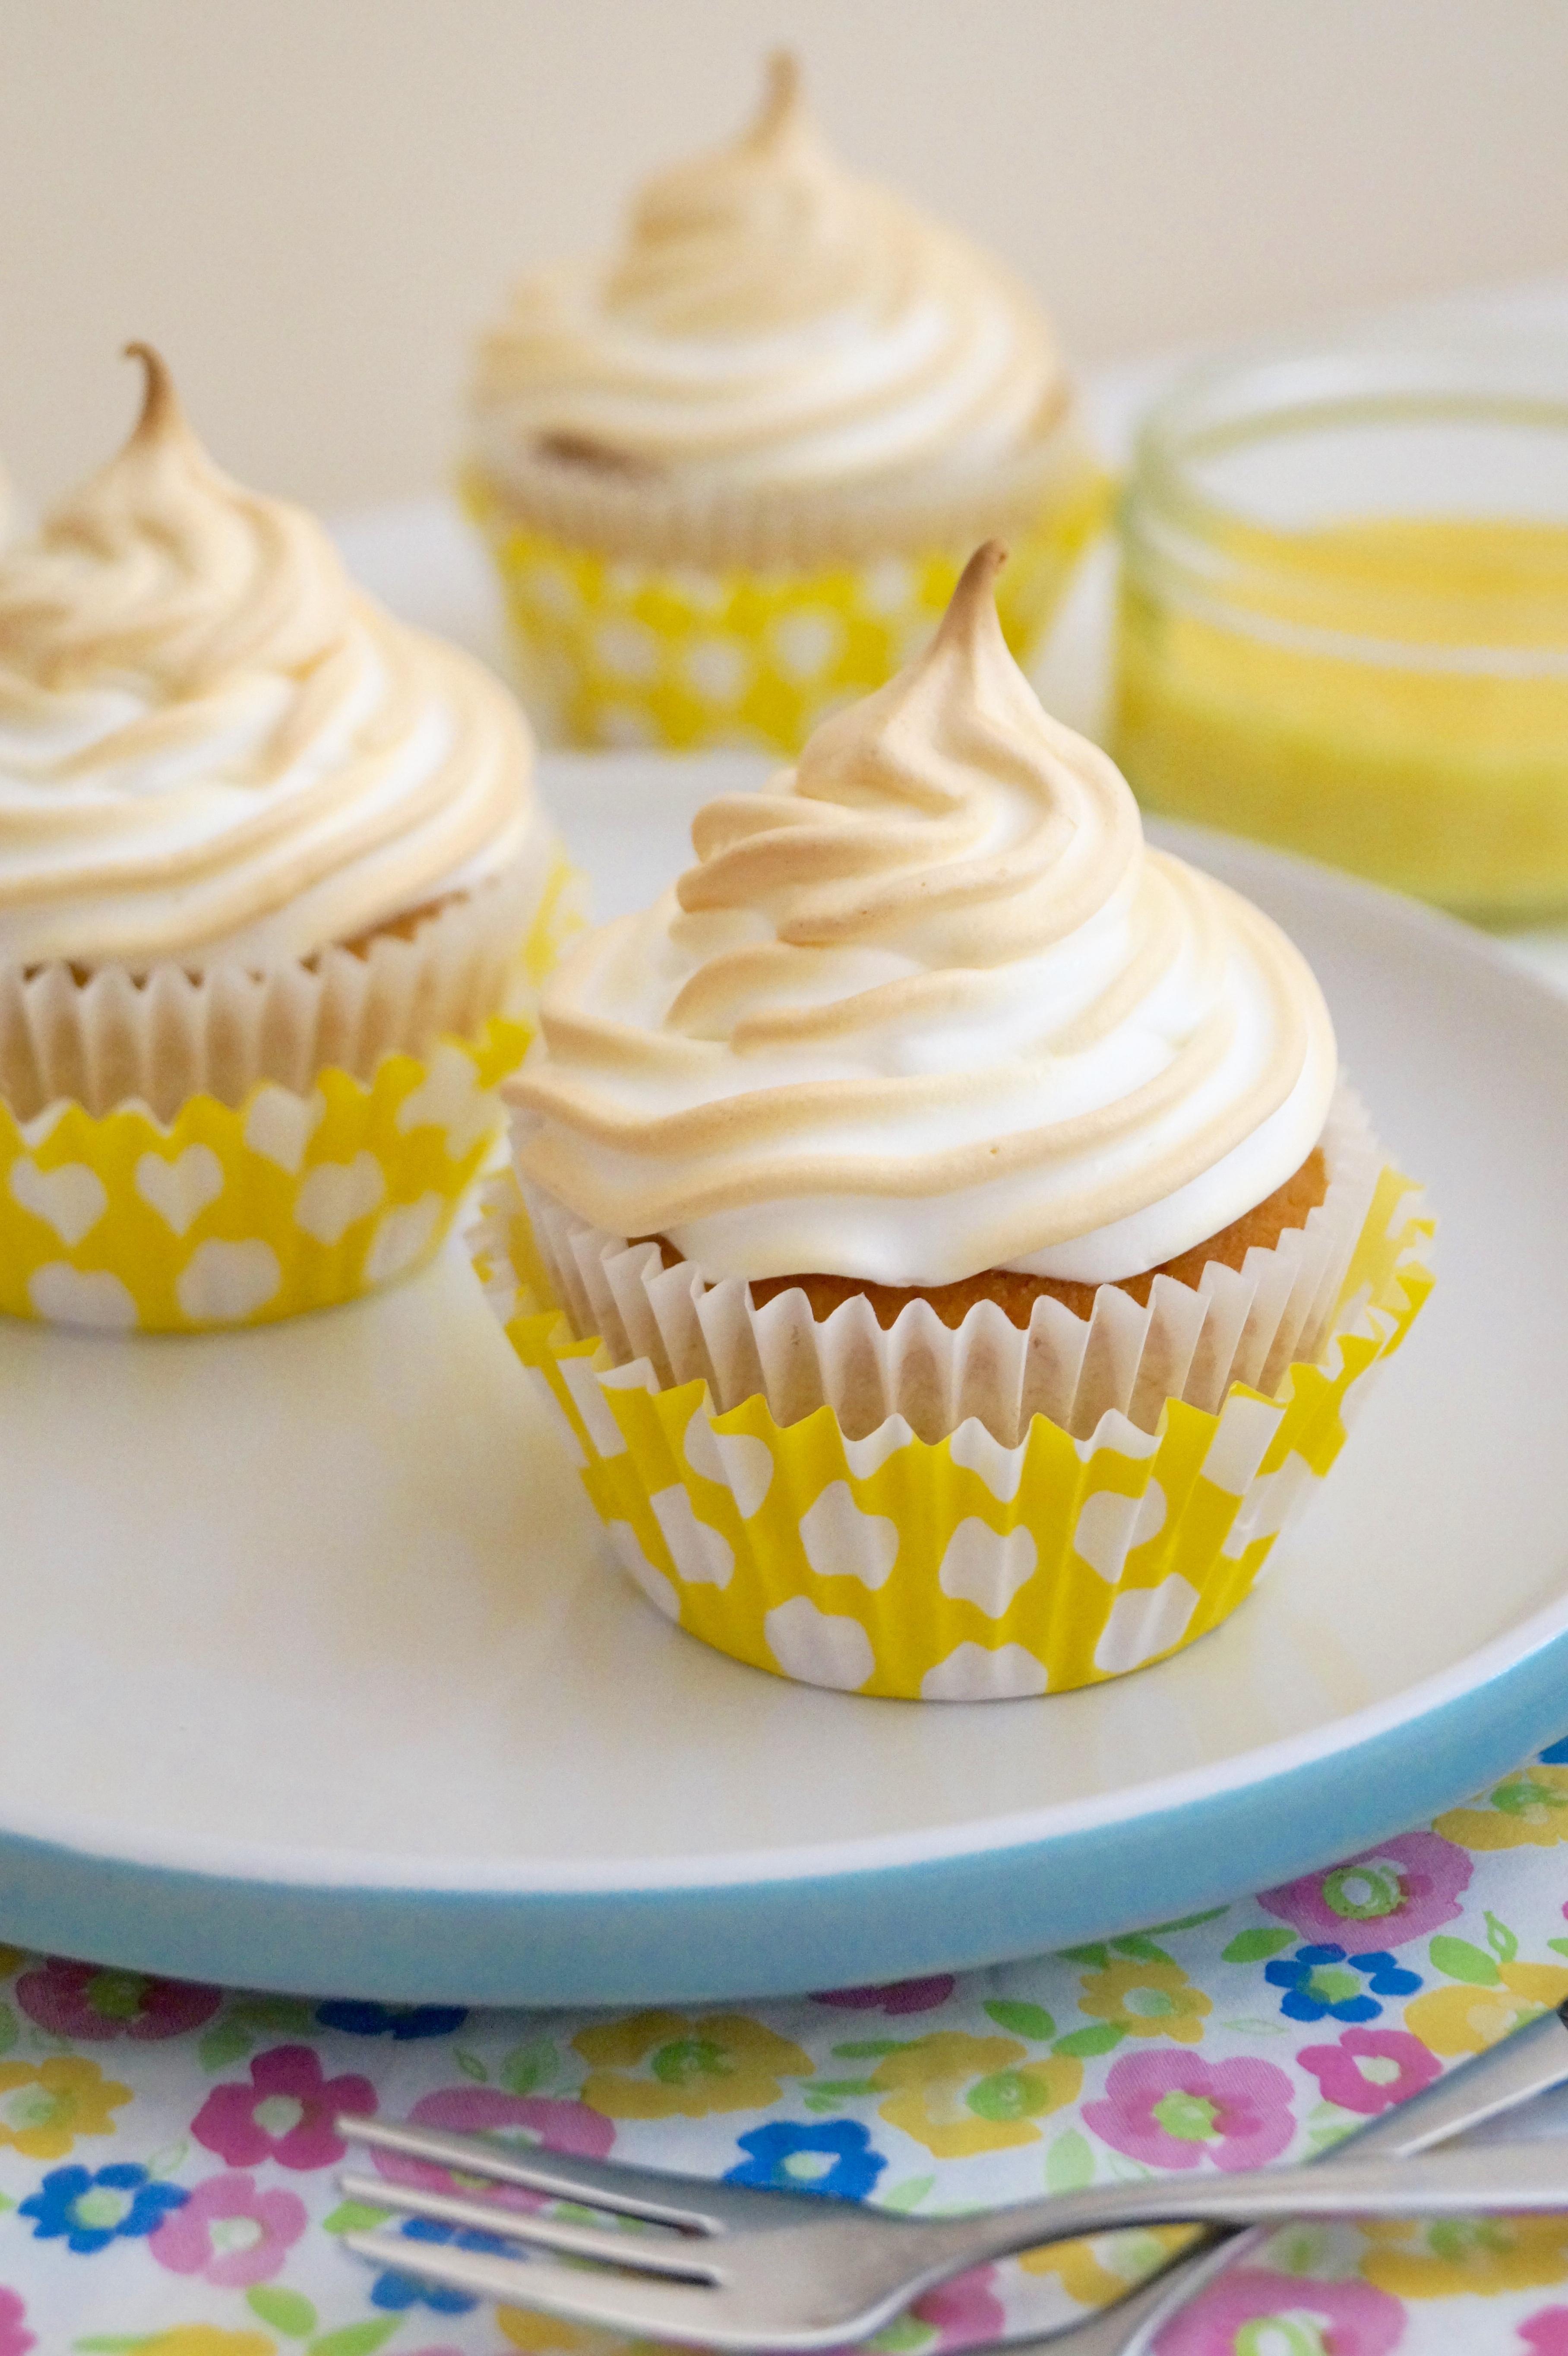 Does meringue require baking?